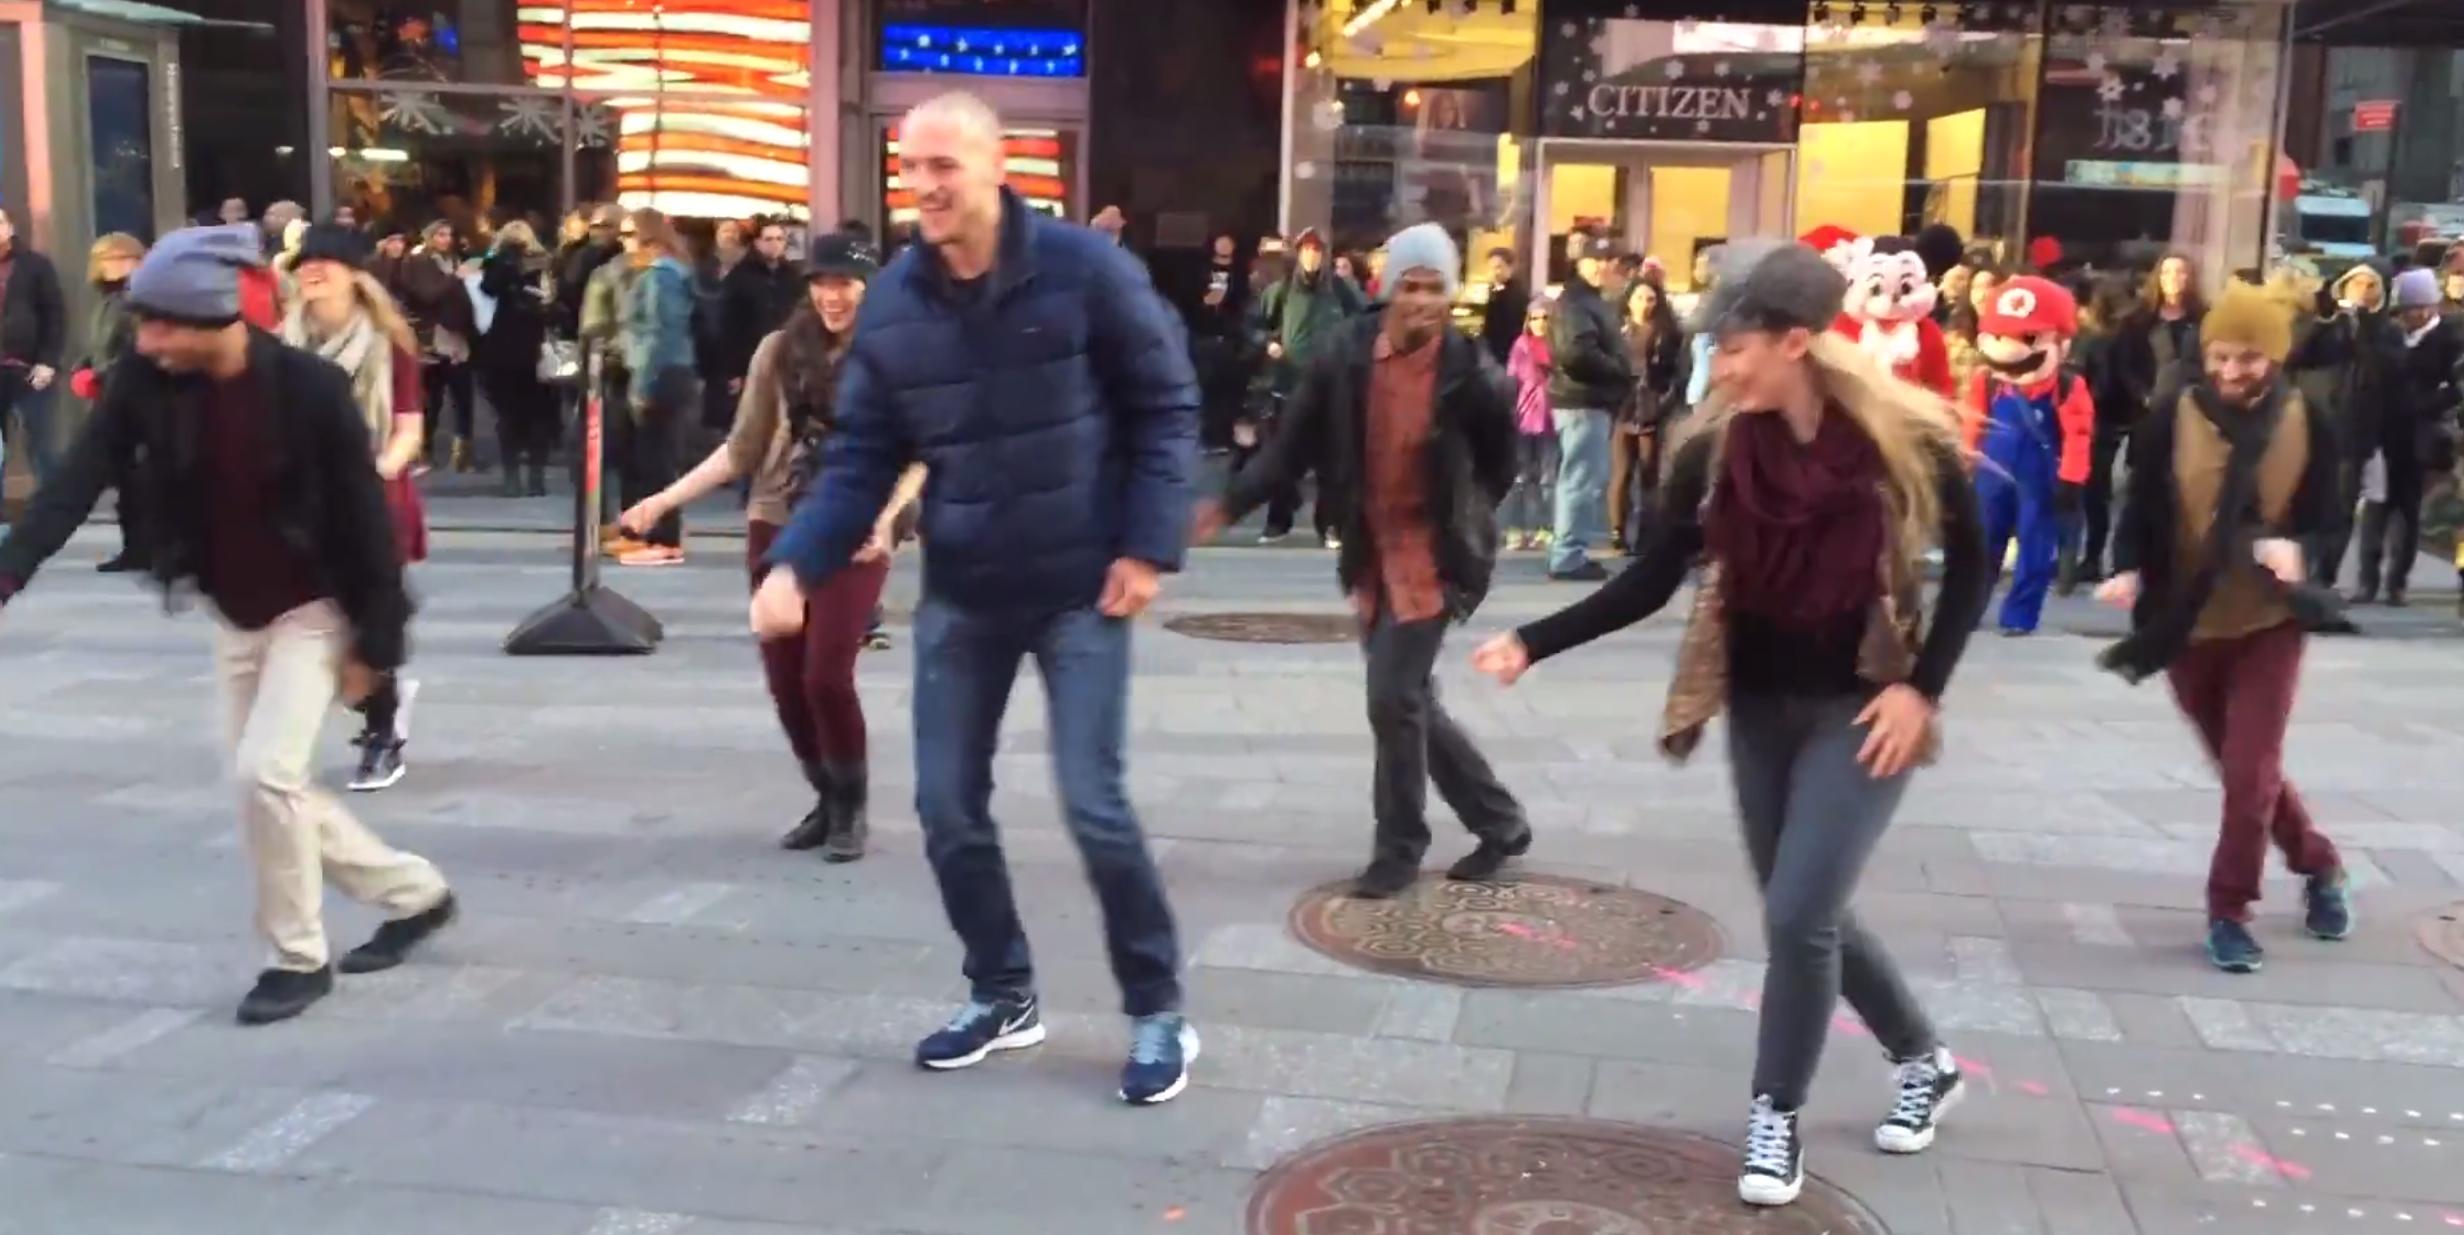 The New York flashmob